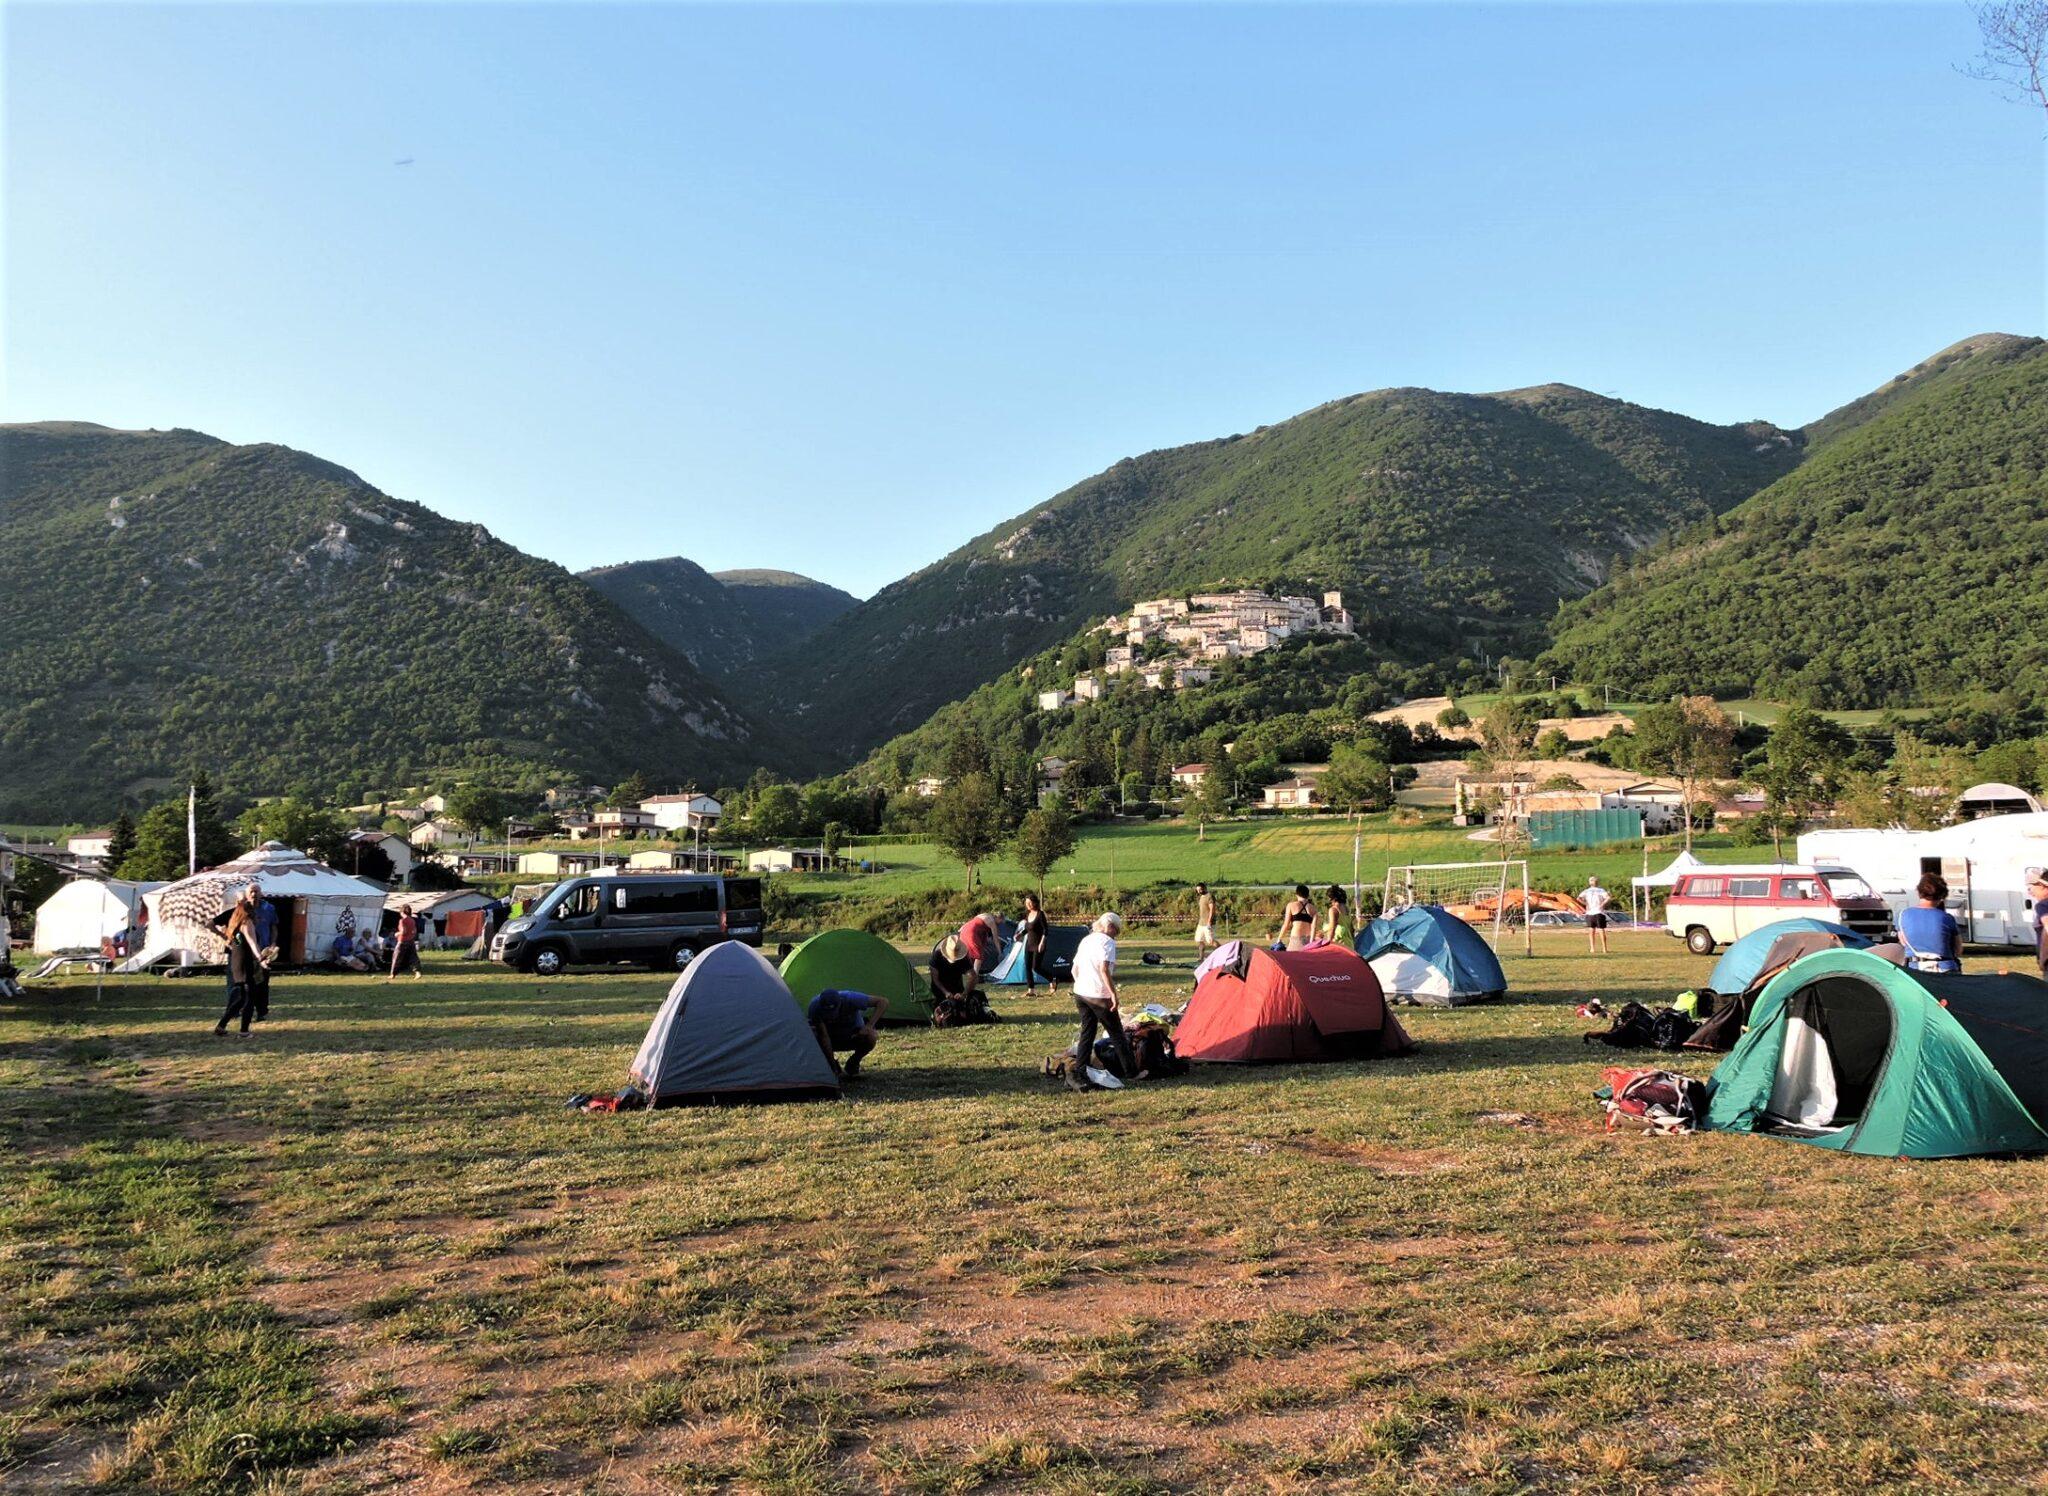 Cammino terre mutate tenda campi norcia 2020 1 scaled